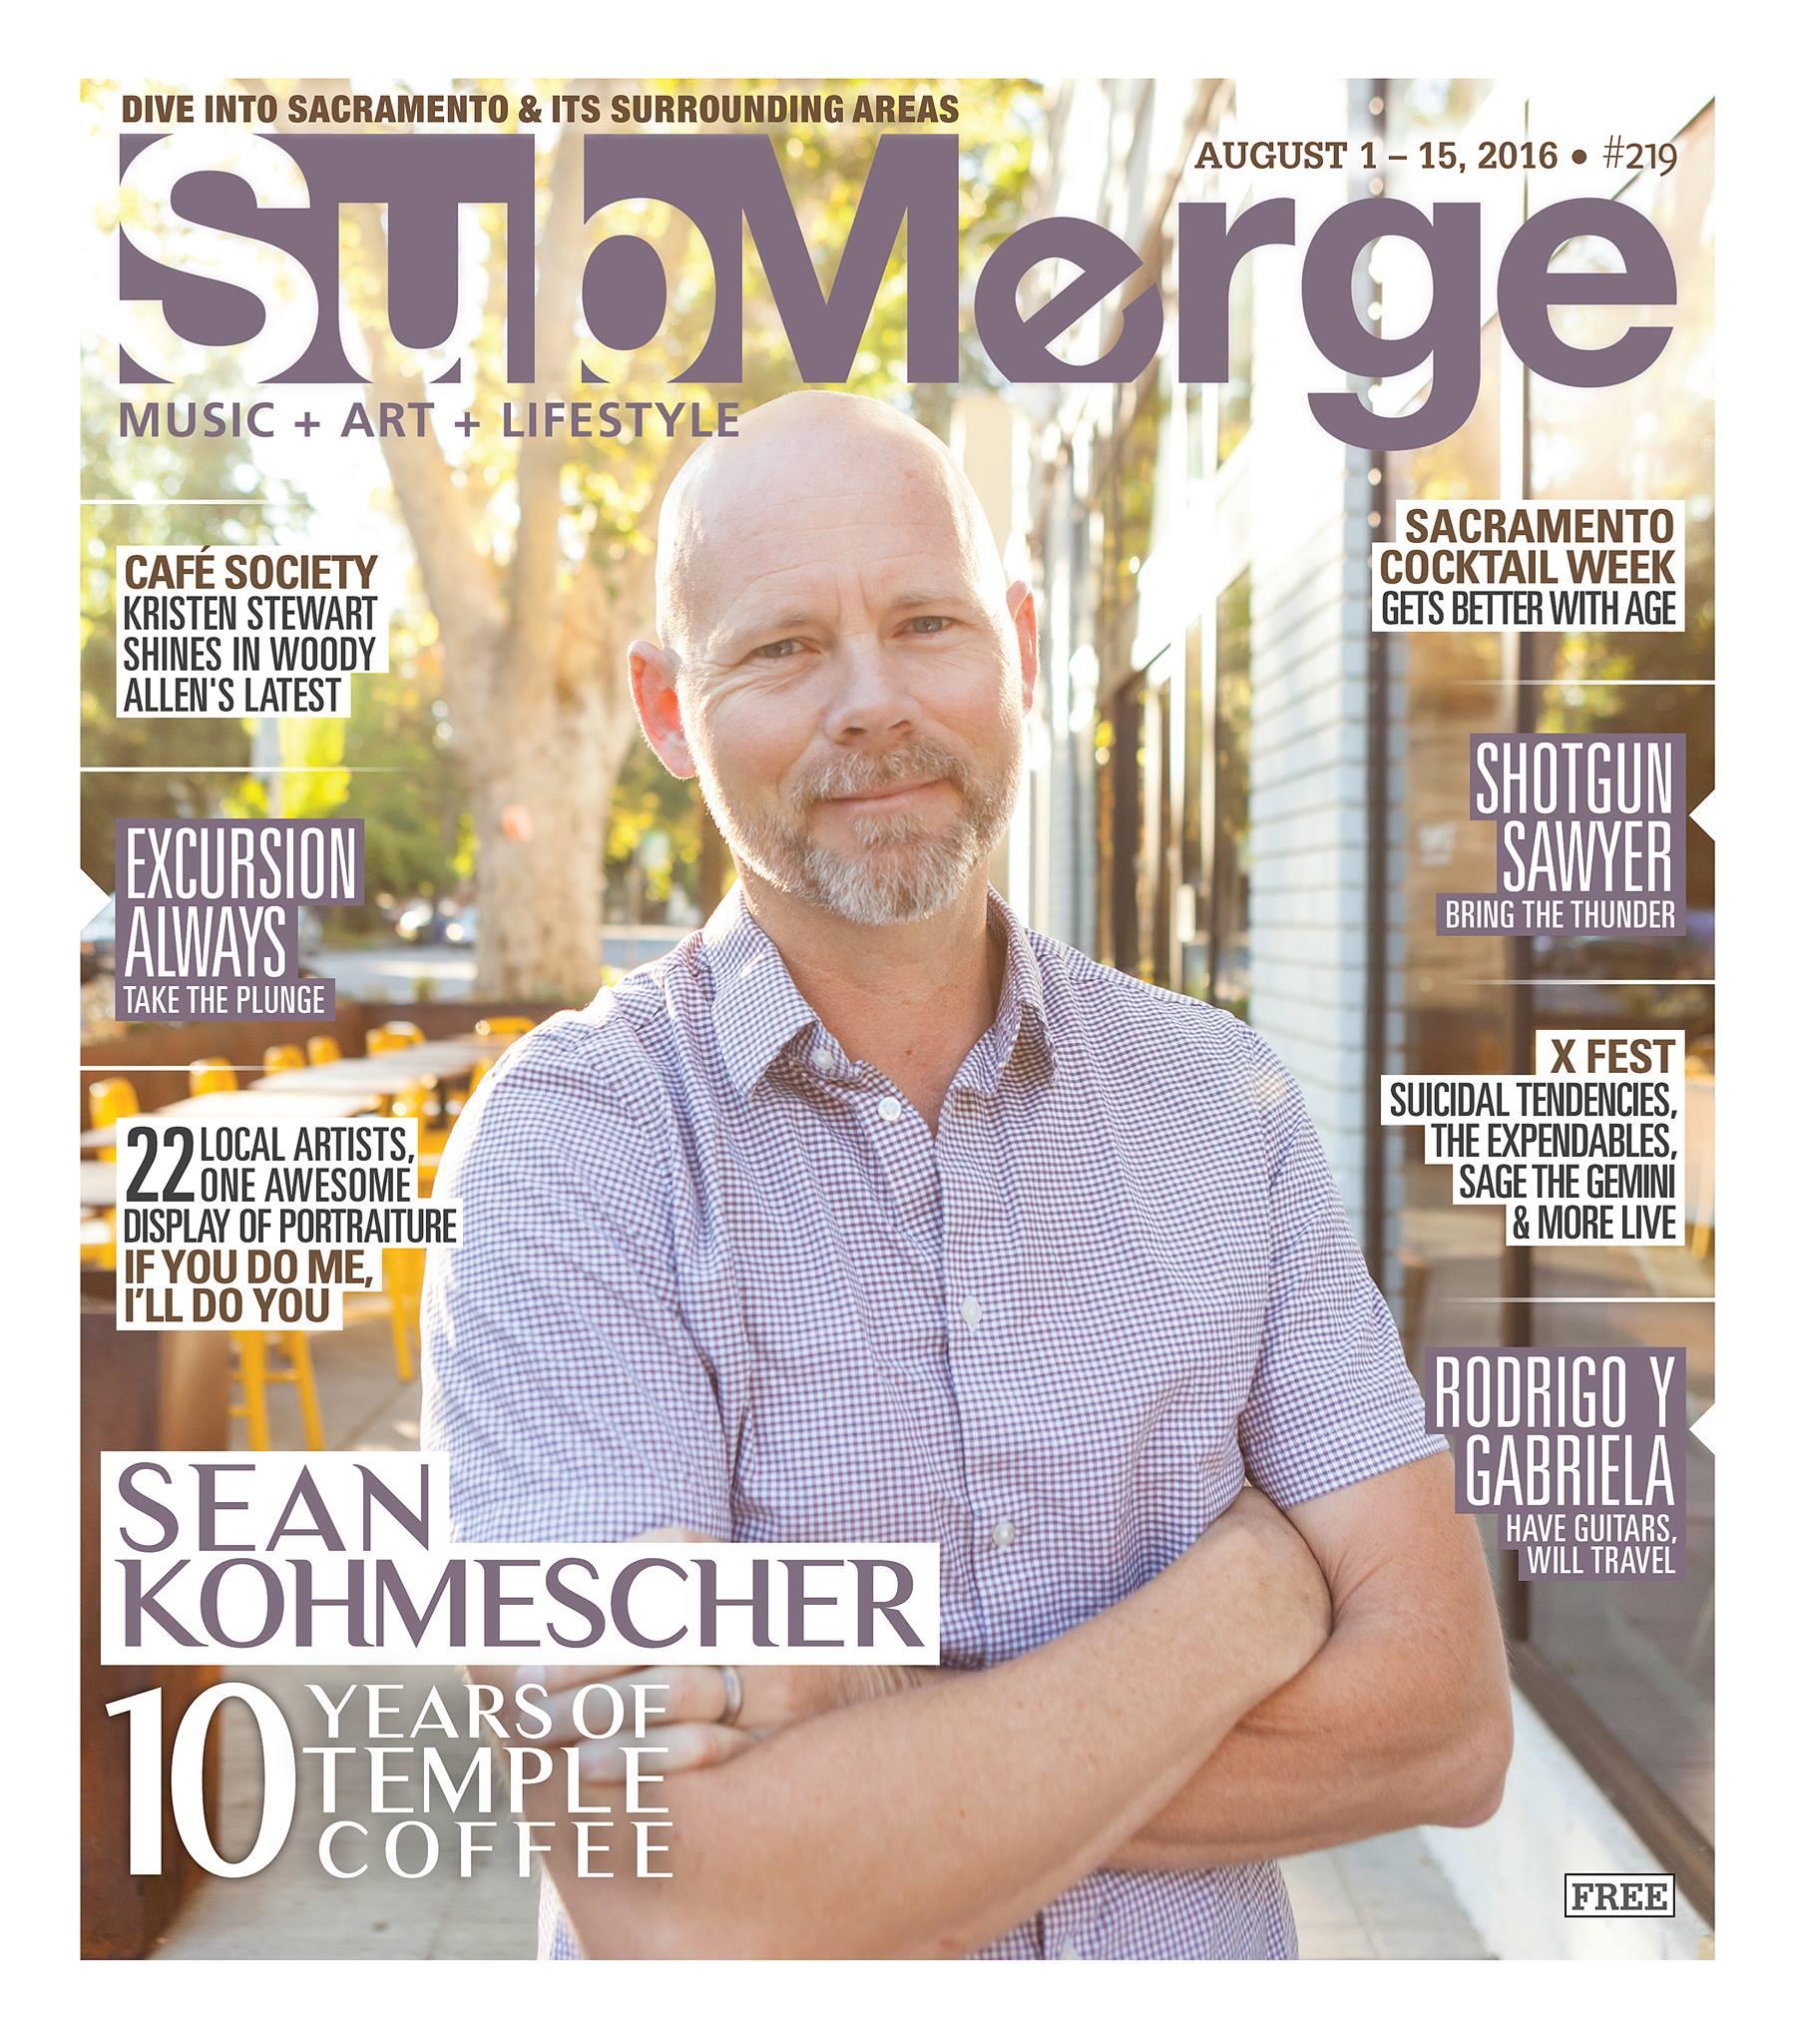 SeanKohmescher_Submerge.jpg